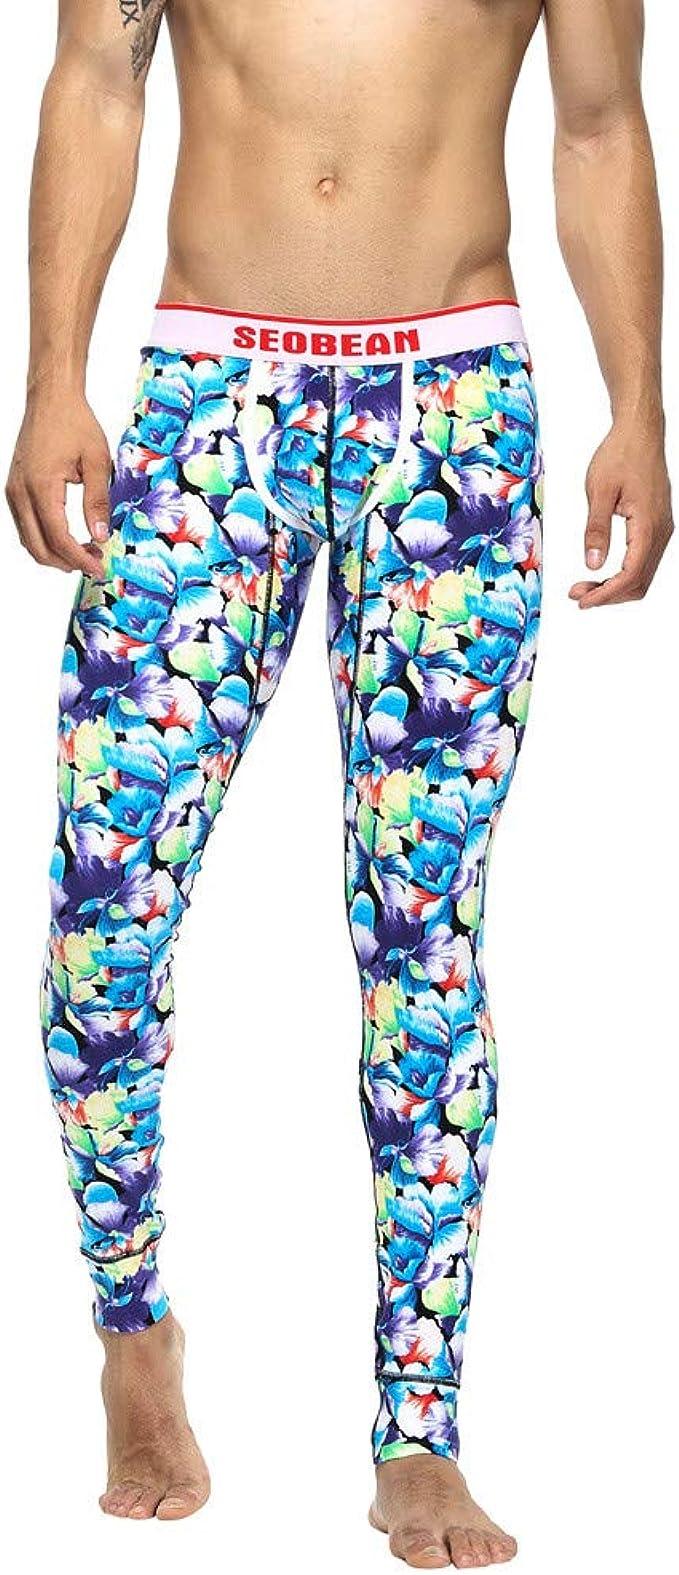 FELZ Leggins Hombre Deporte, Floral Estampados Pantalones térmicos ...